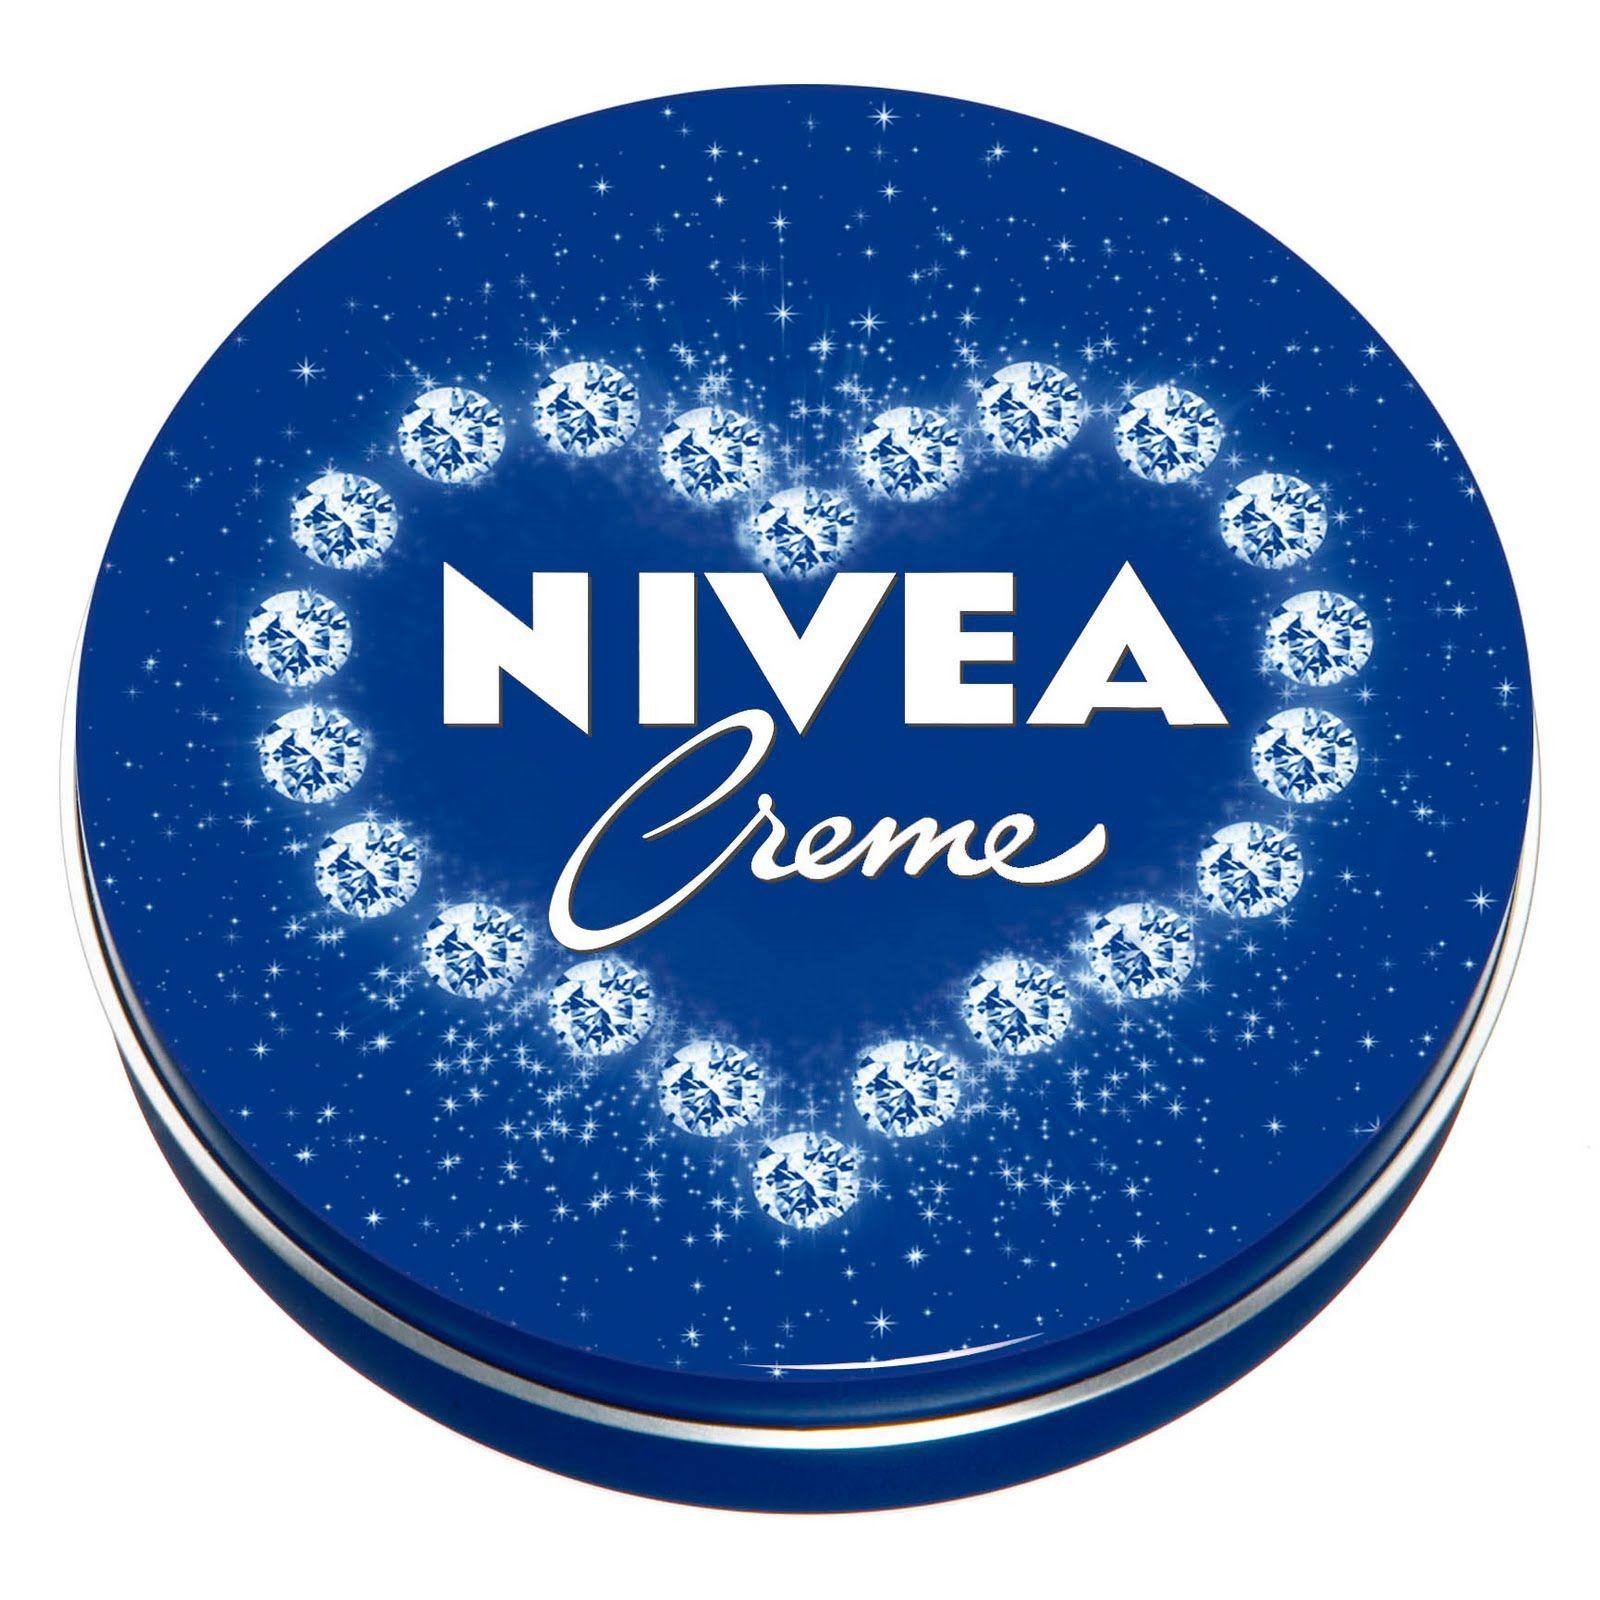 Love the sparkles on the NIVEA tin.